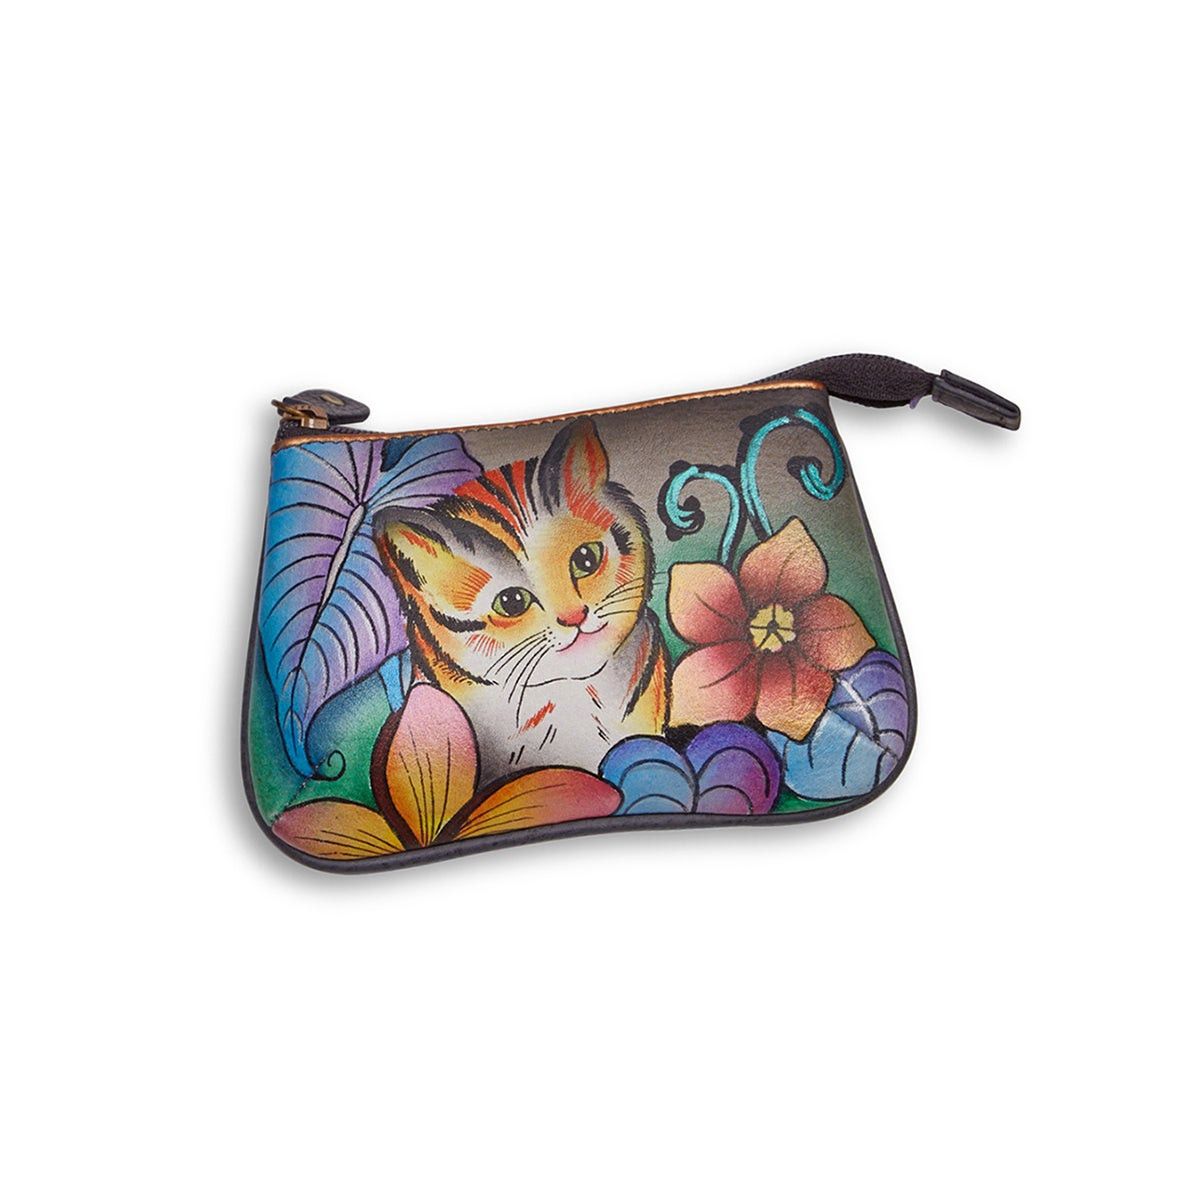 Painted lthr CatsInWonderland coin purse